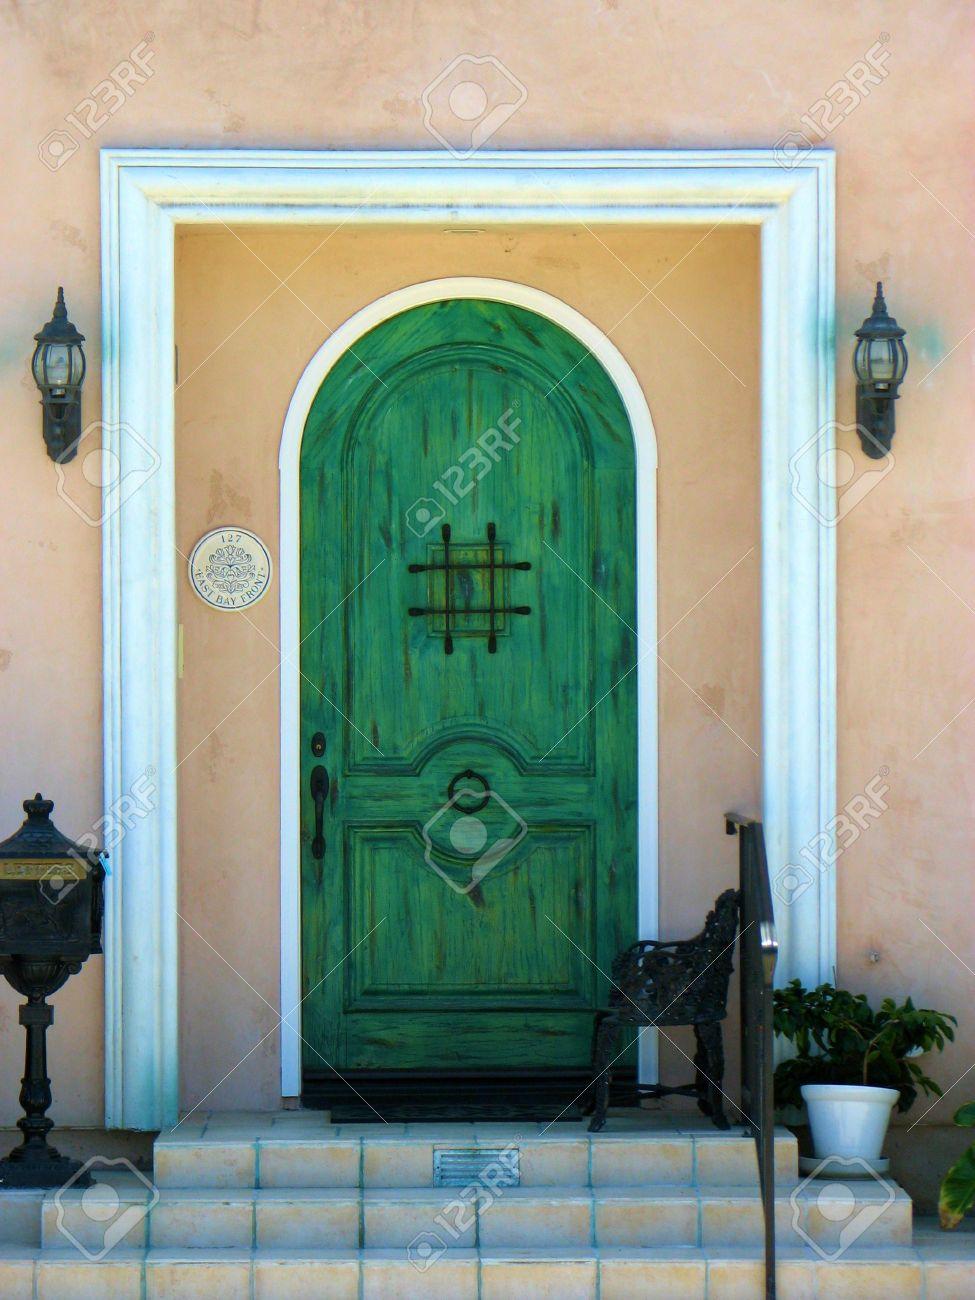 Green Door Arch Entry Entrance Front Door Square Steps Stoop Stock